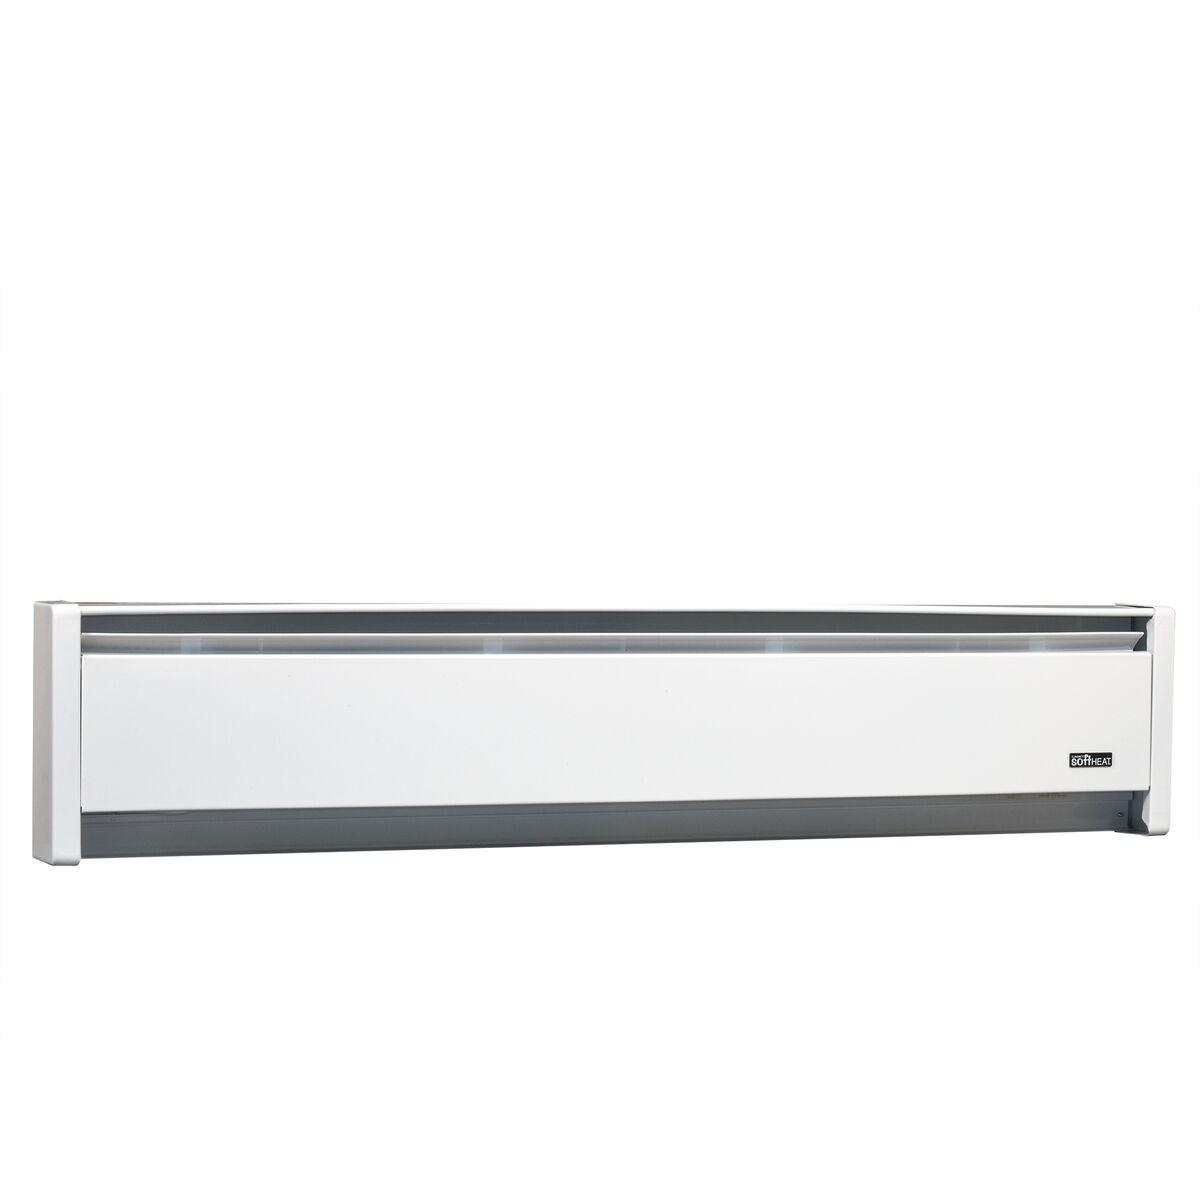 Cadet baseboard heater